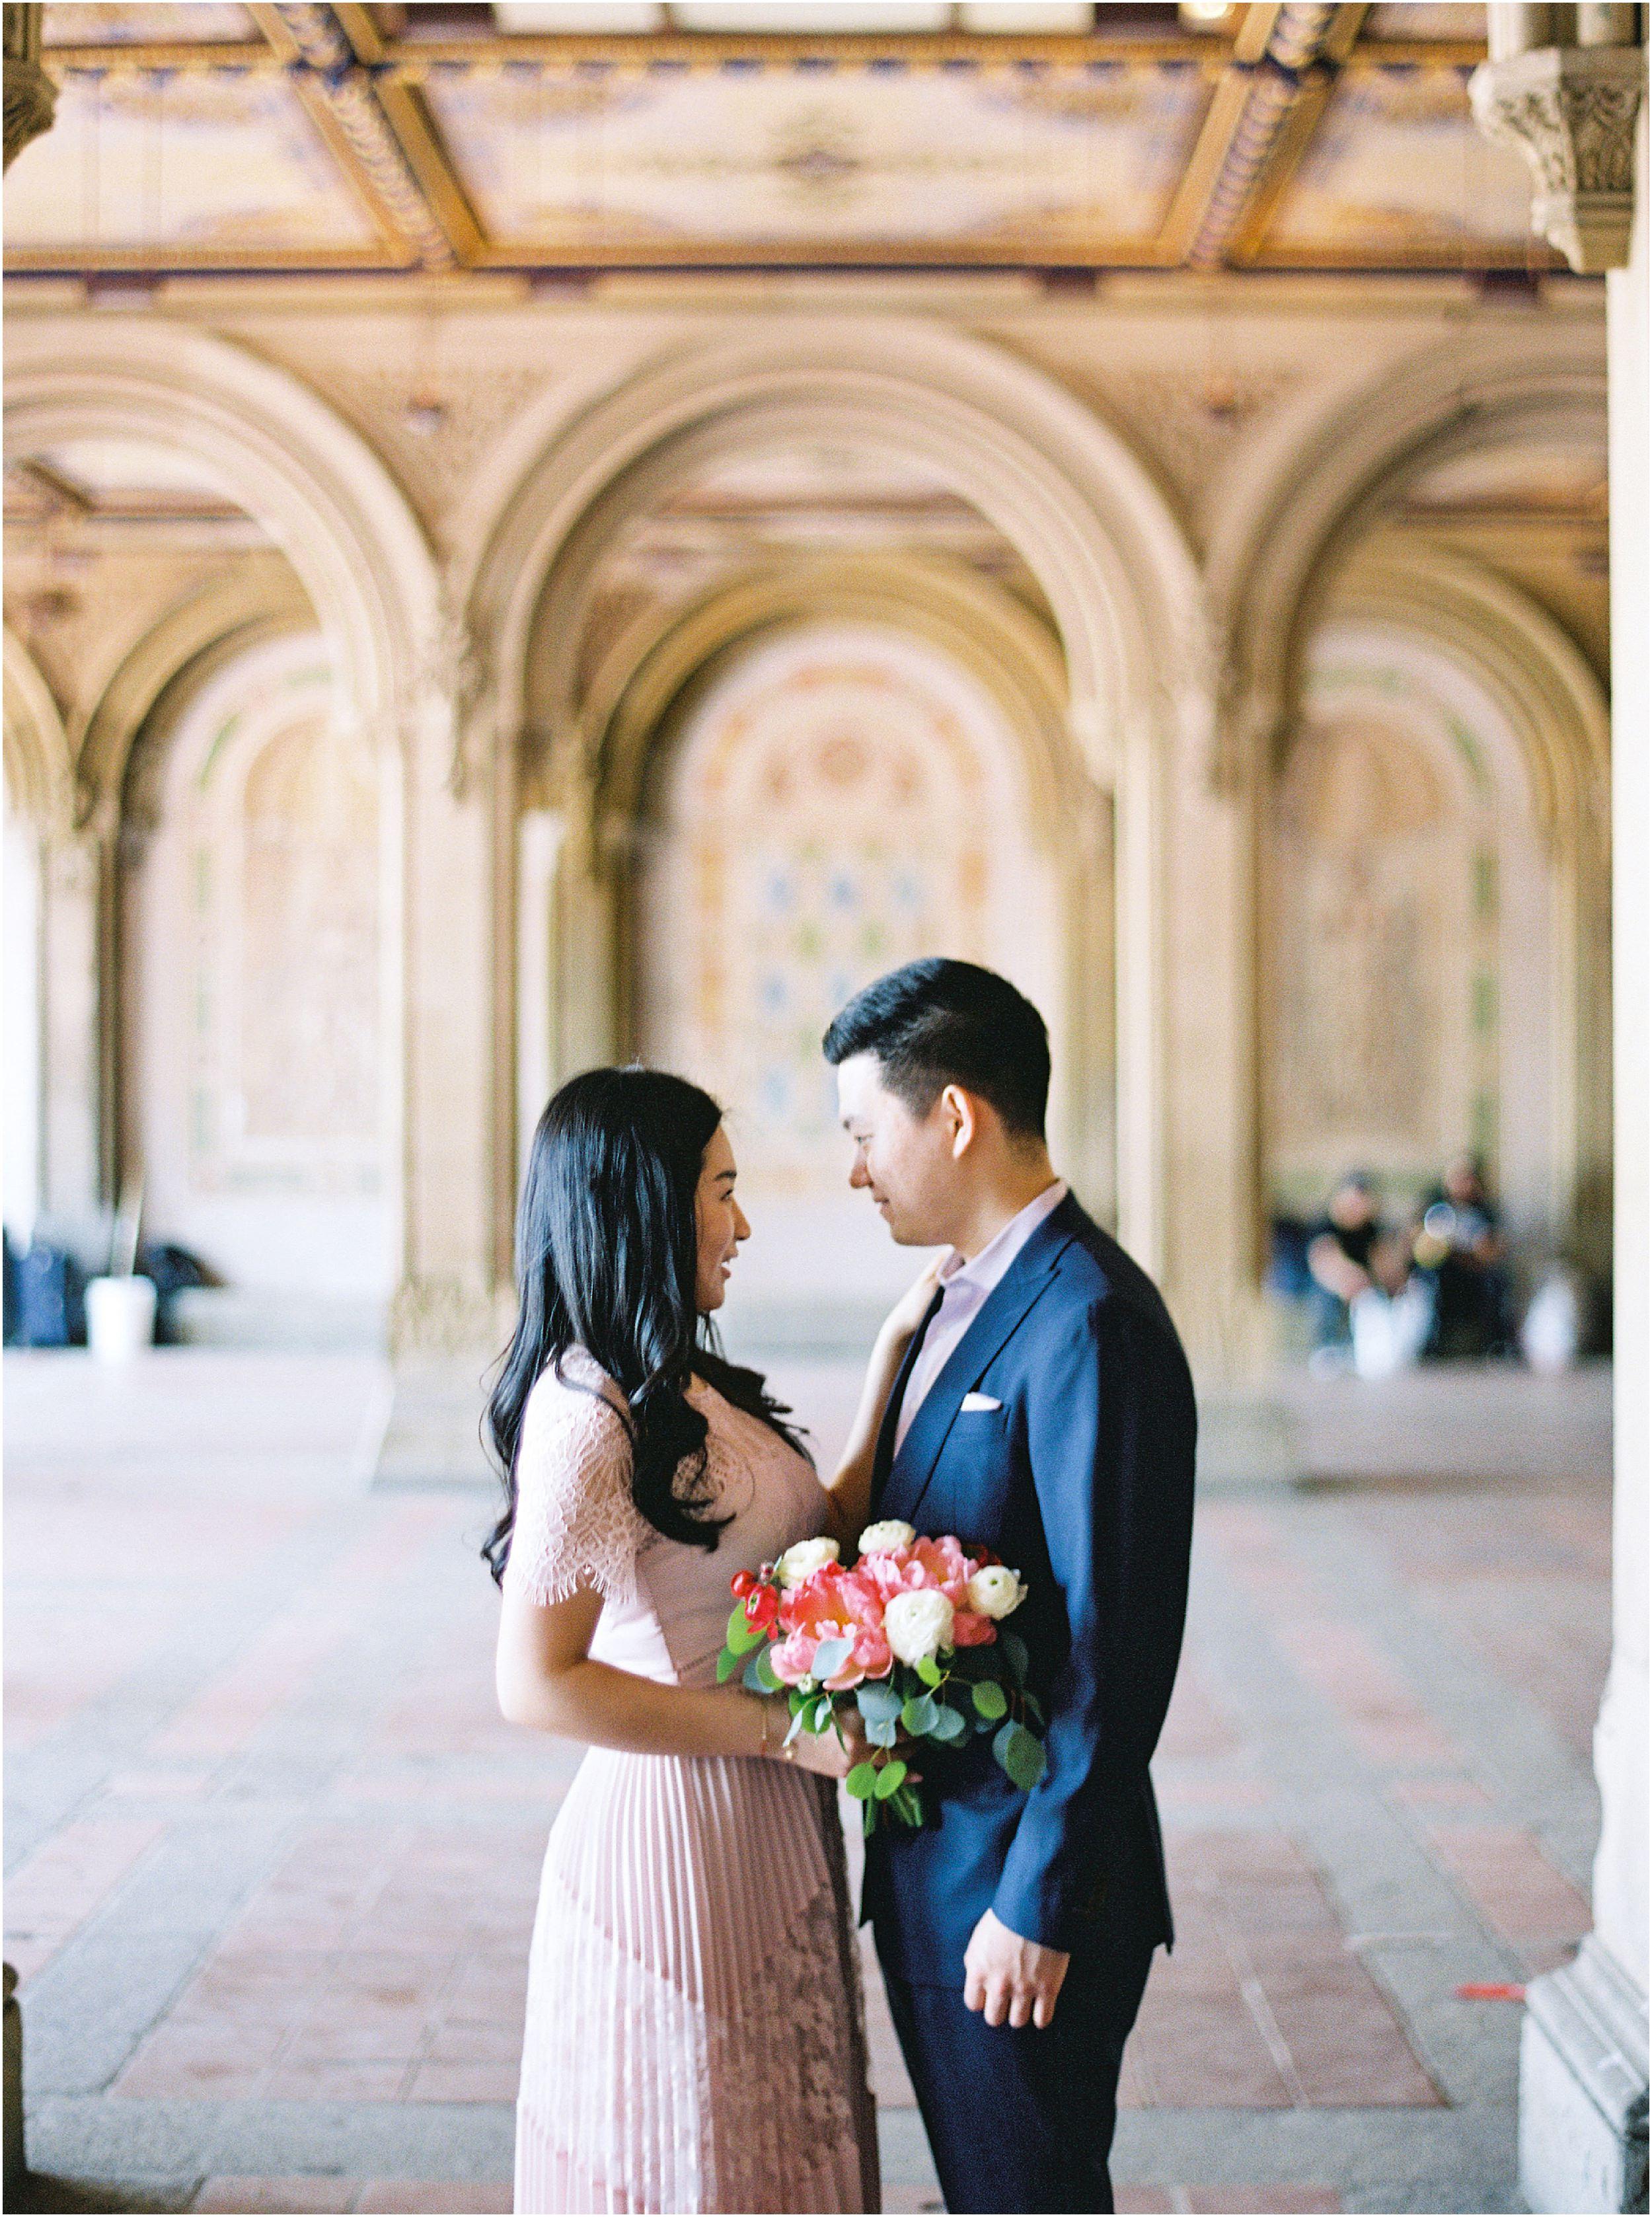 JeremiahRachelPhotography_CentralPark_NYC_SpringtimeBloom_EngagementSession0012.JPG